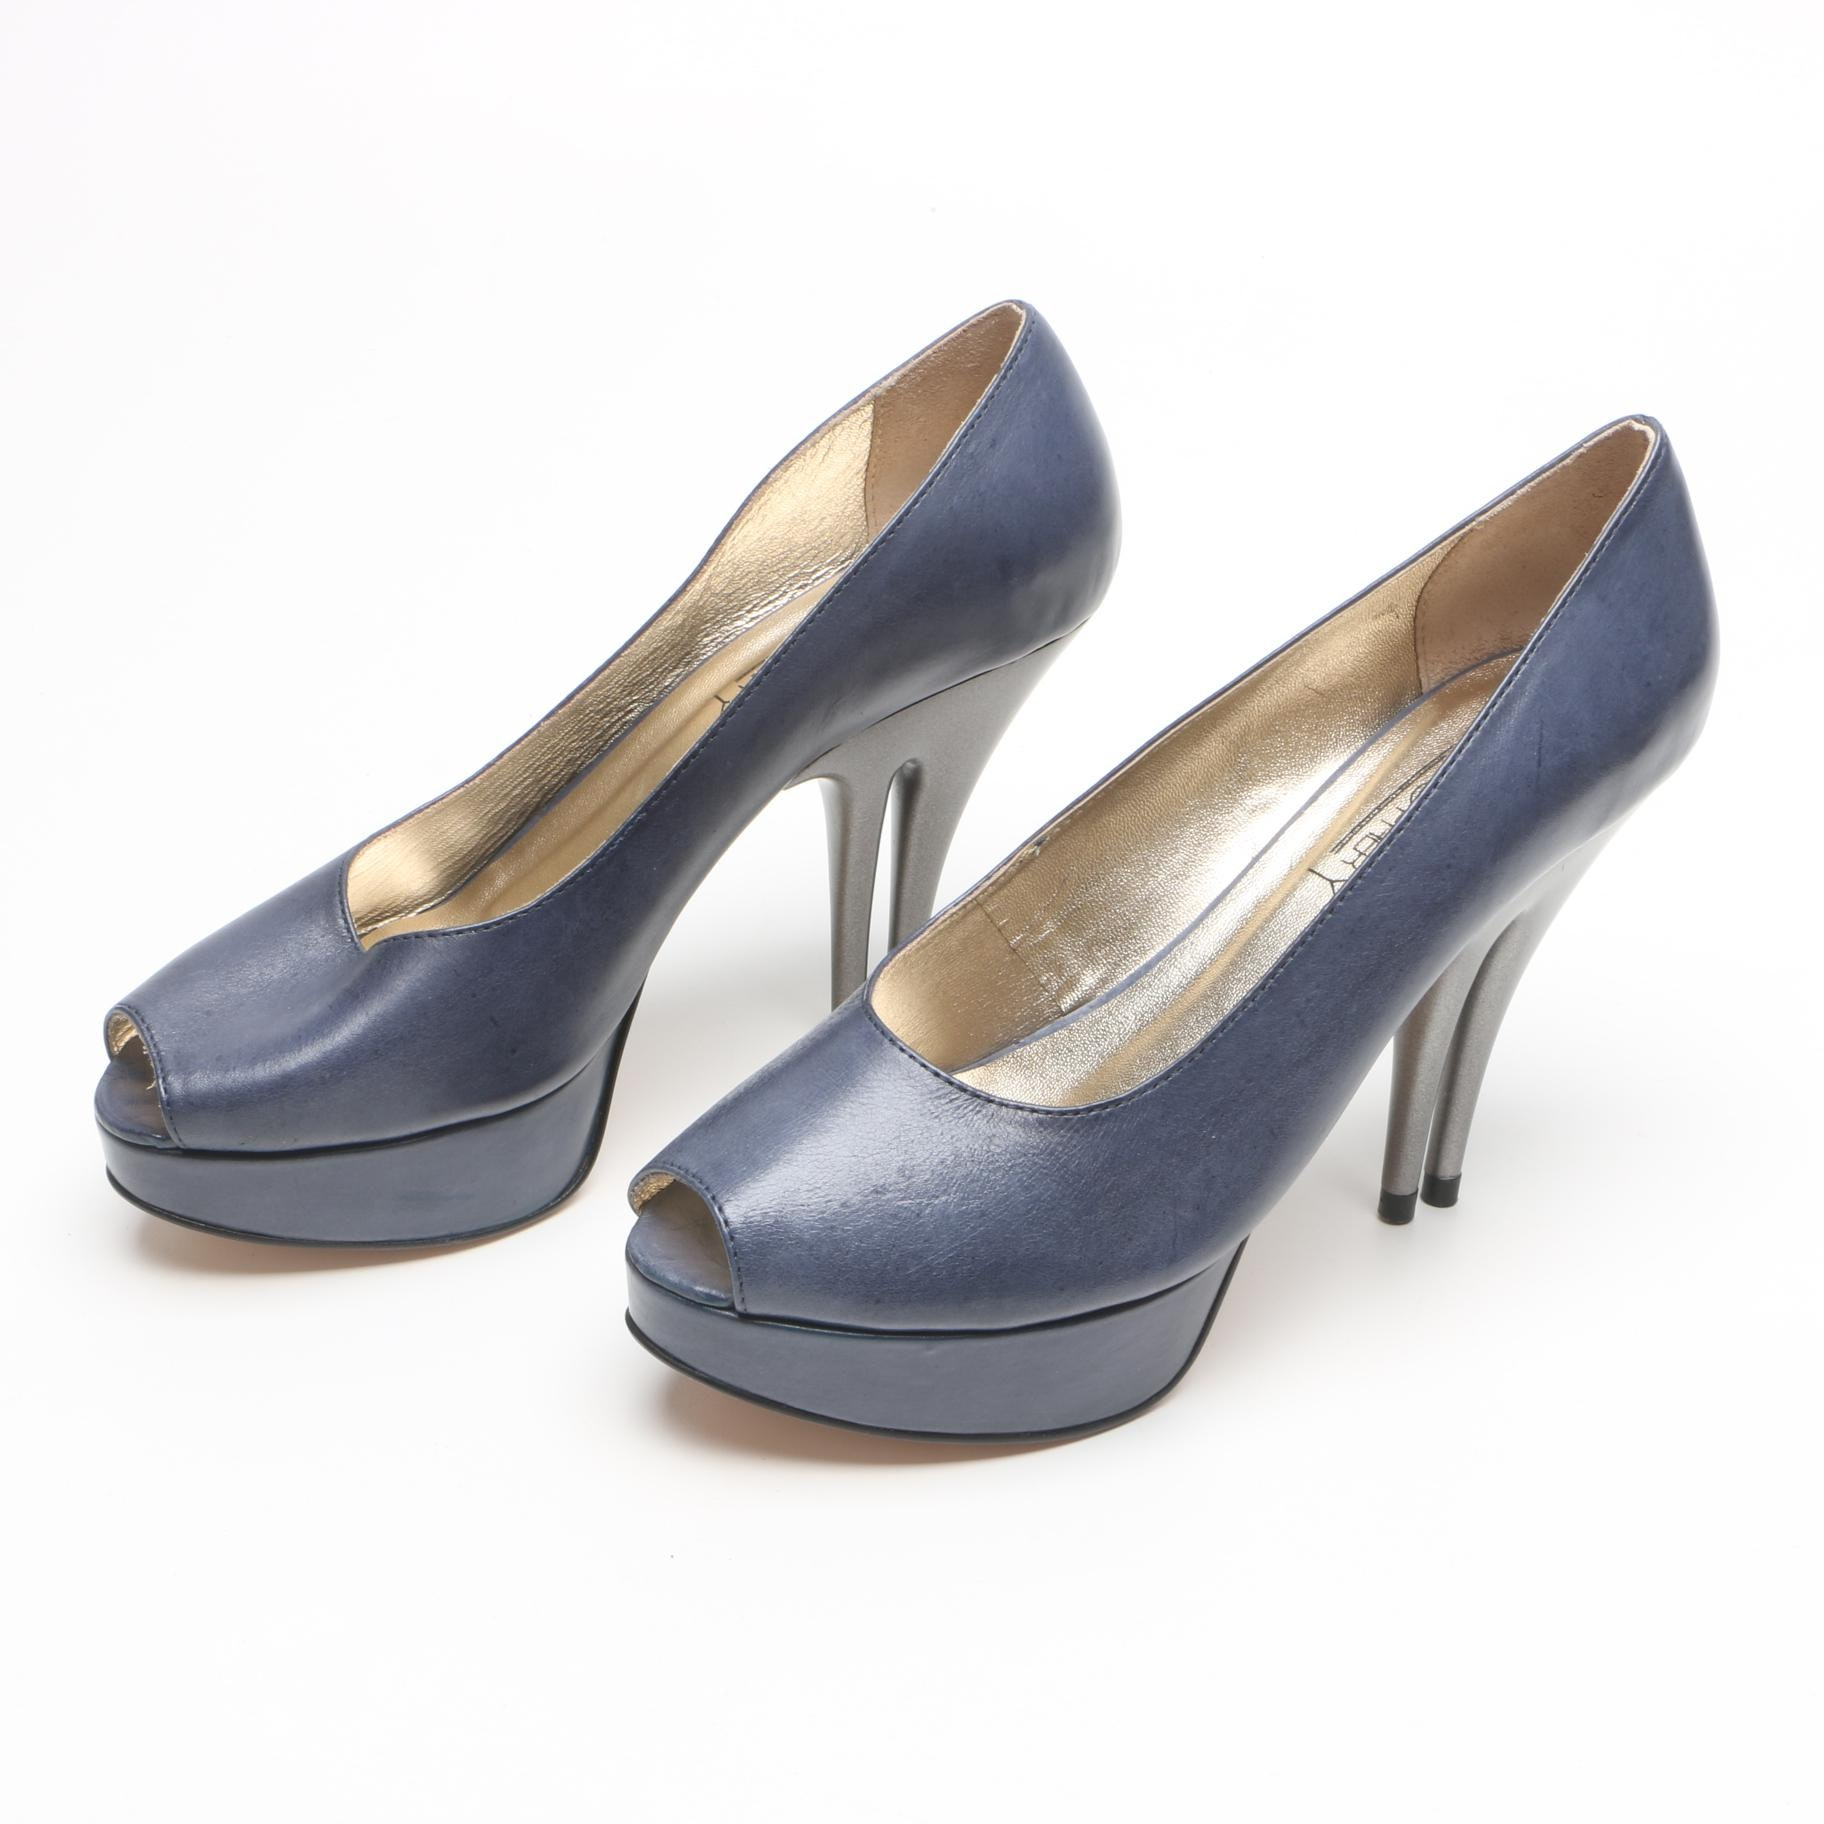 Christopher Coy Blueberry Dual Heeled Stilettos